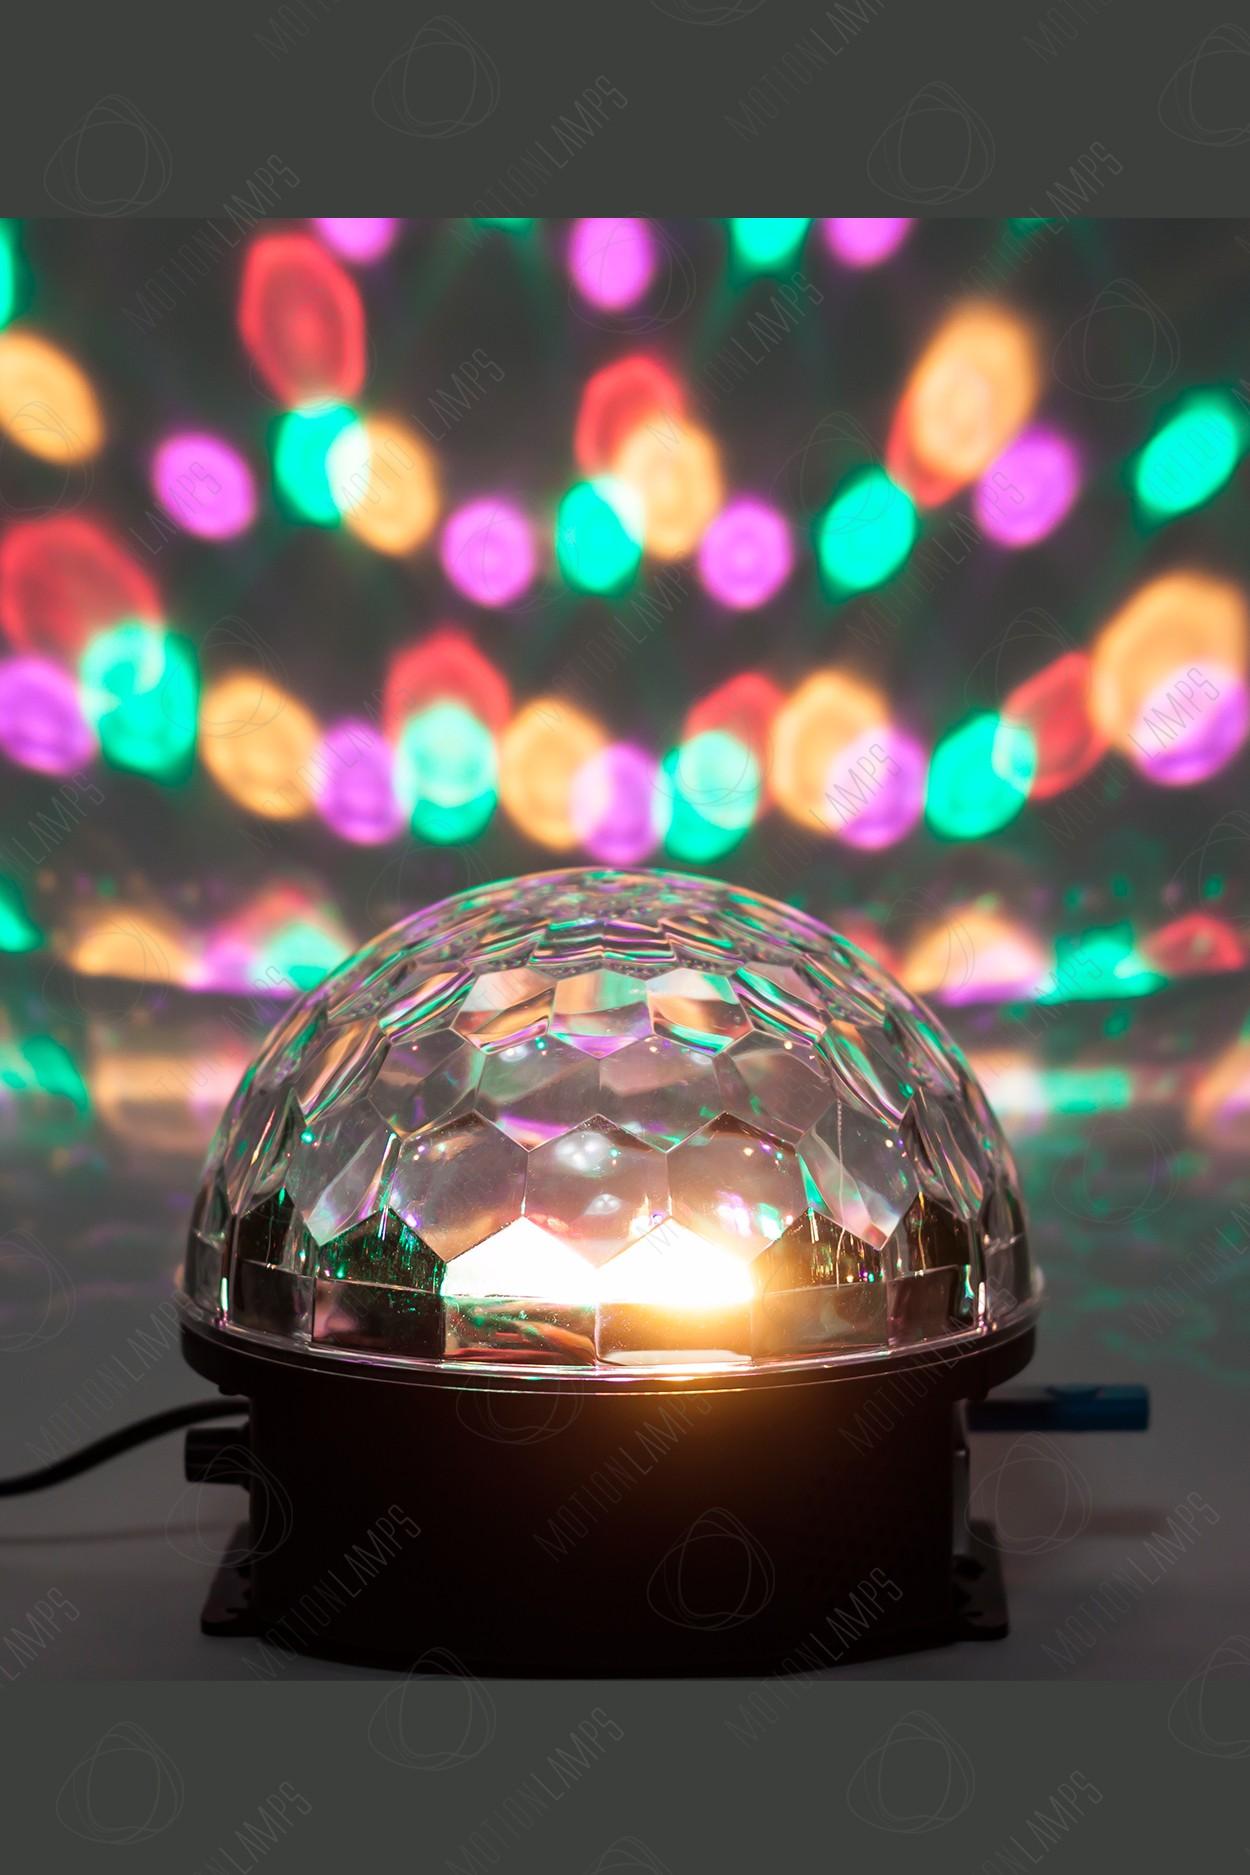 Уцененный товар! Музыкальный диско-шар LED Crystal Magic Ball Light